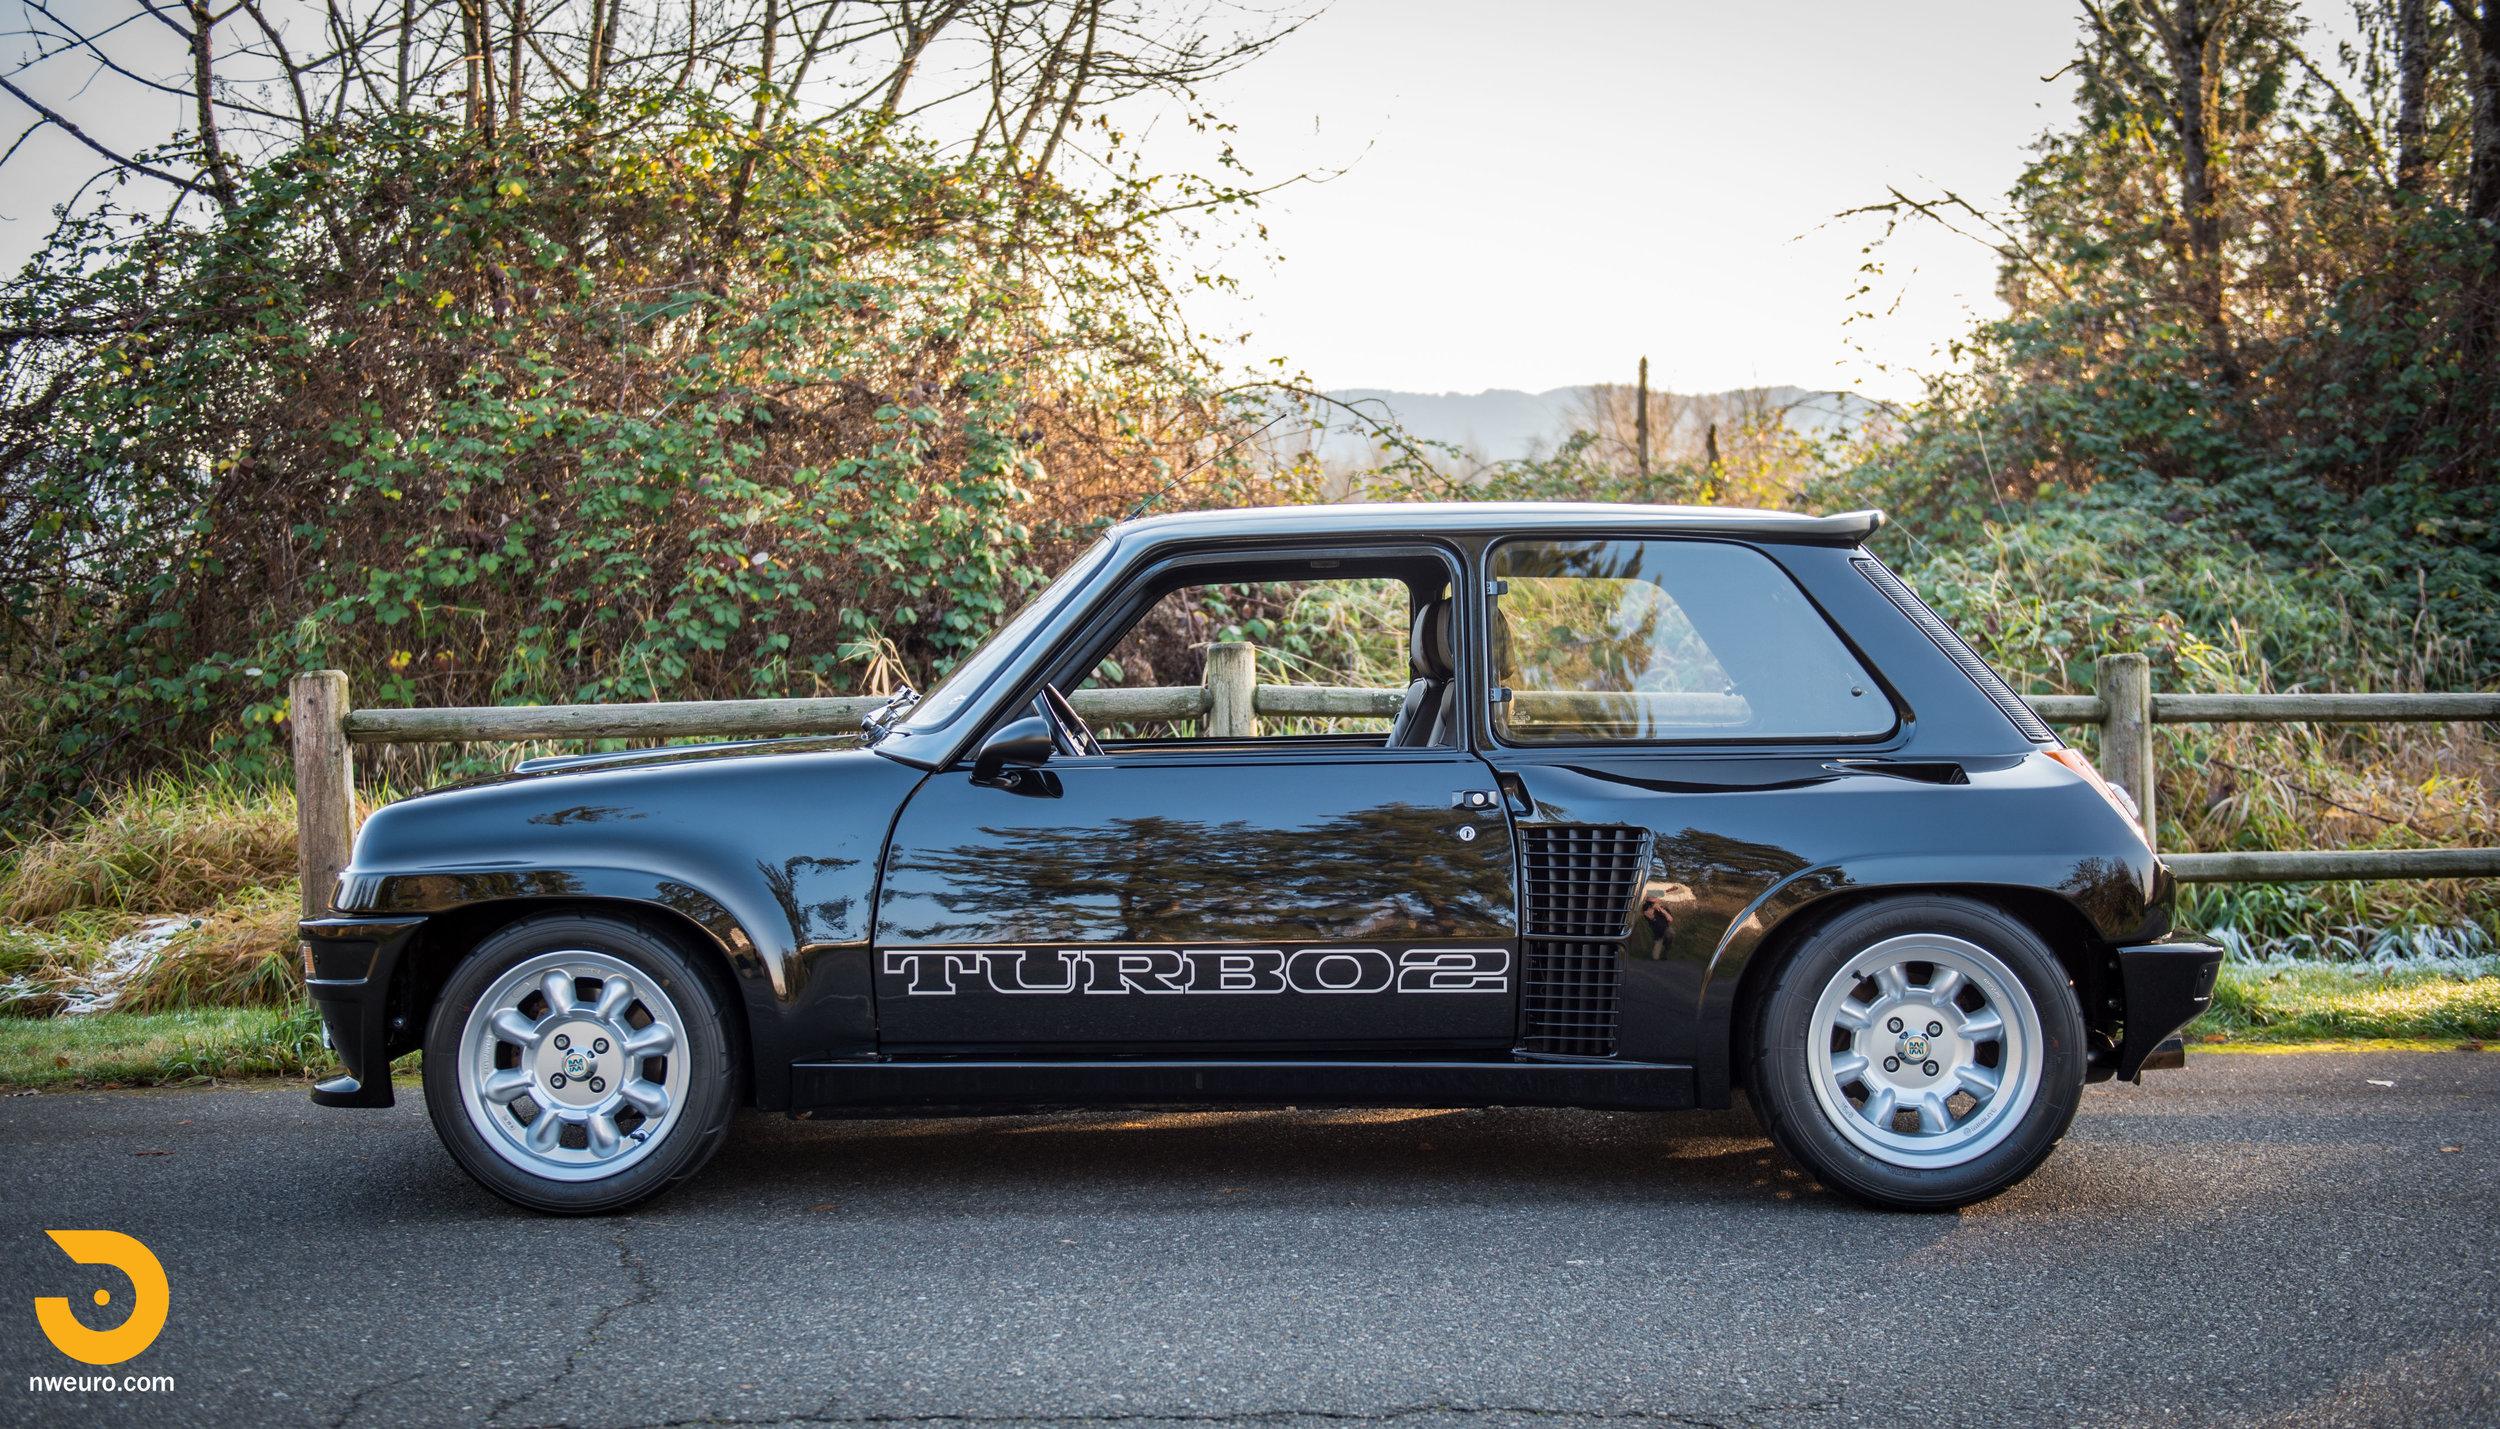 1983 Renault R5 Turbo 2 Black at Park-10.jpg